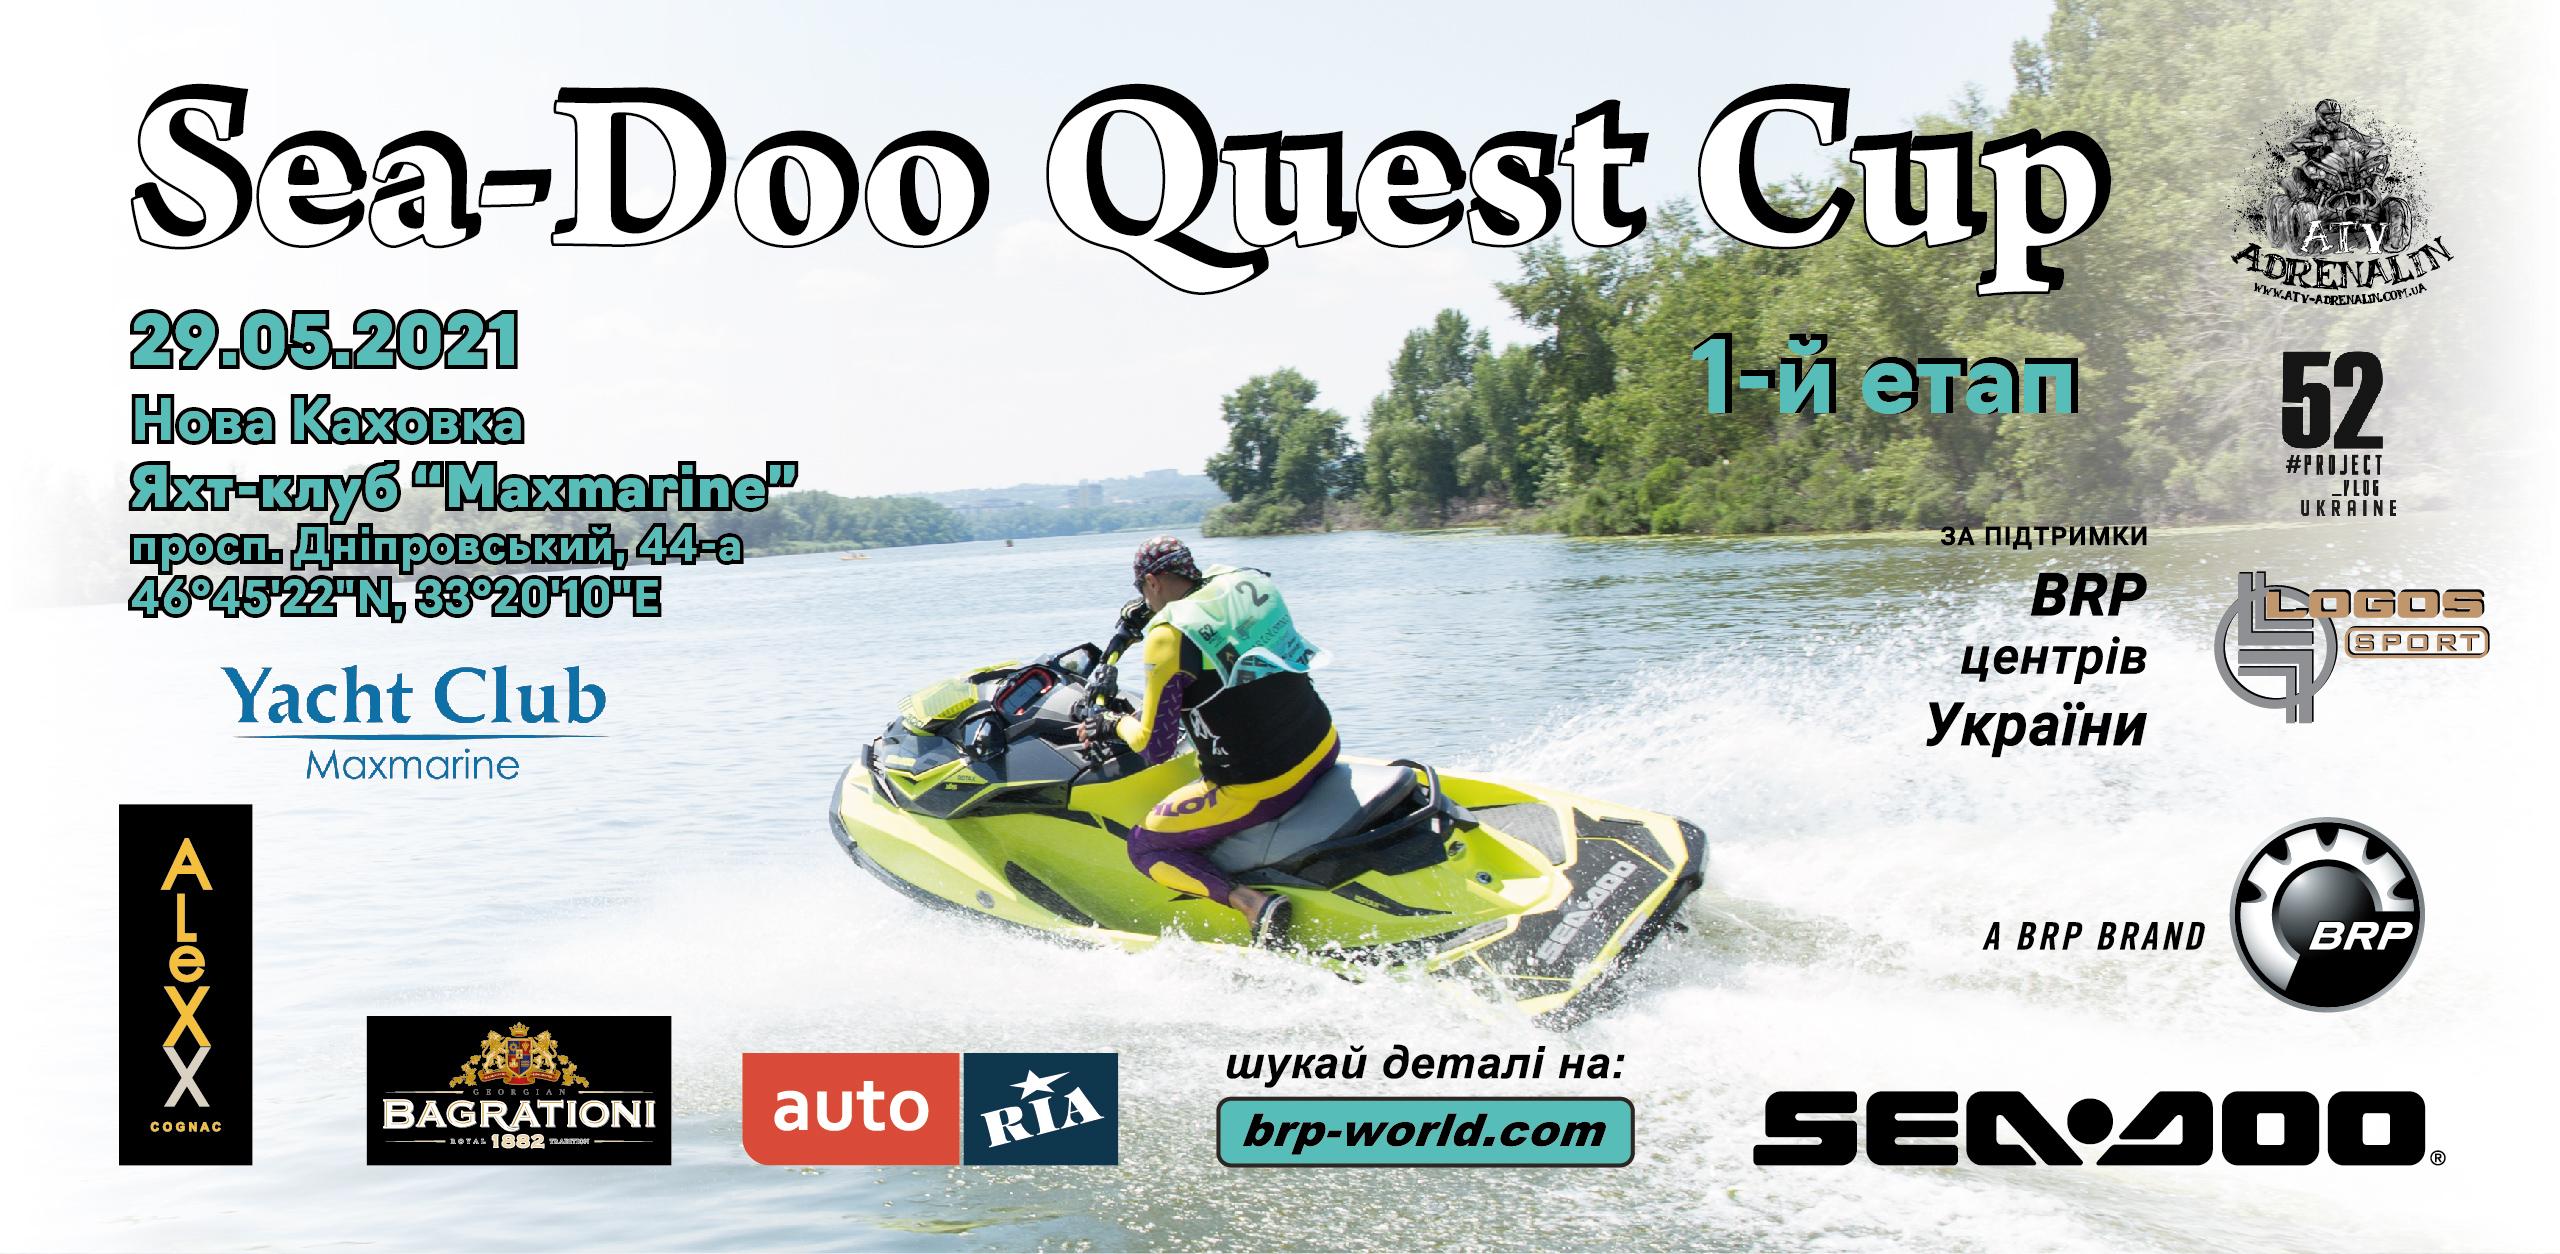 Sea-Doo Quest Cup 2021. Перший етап!